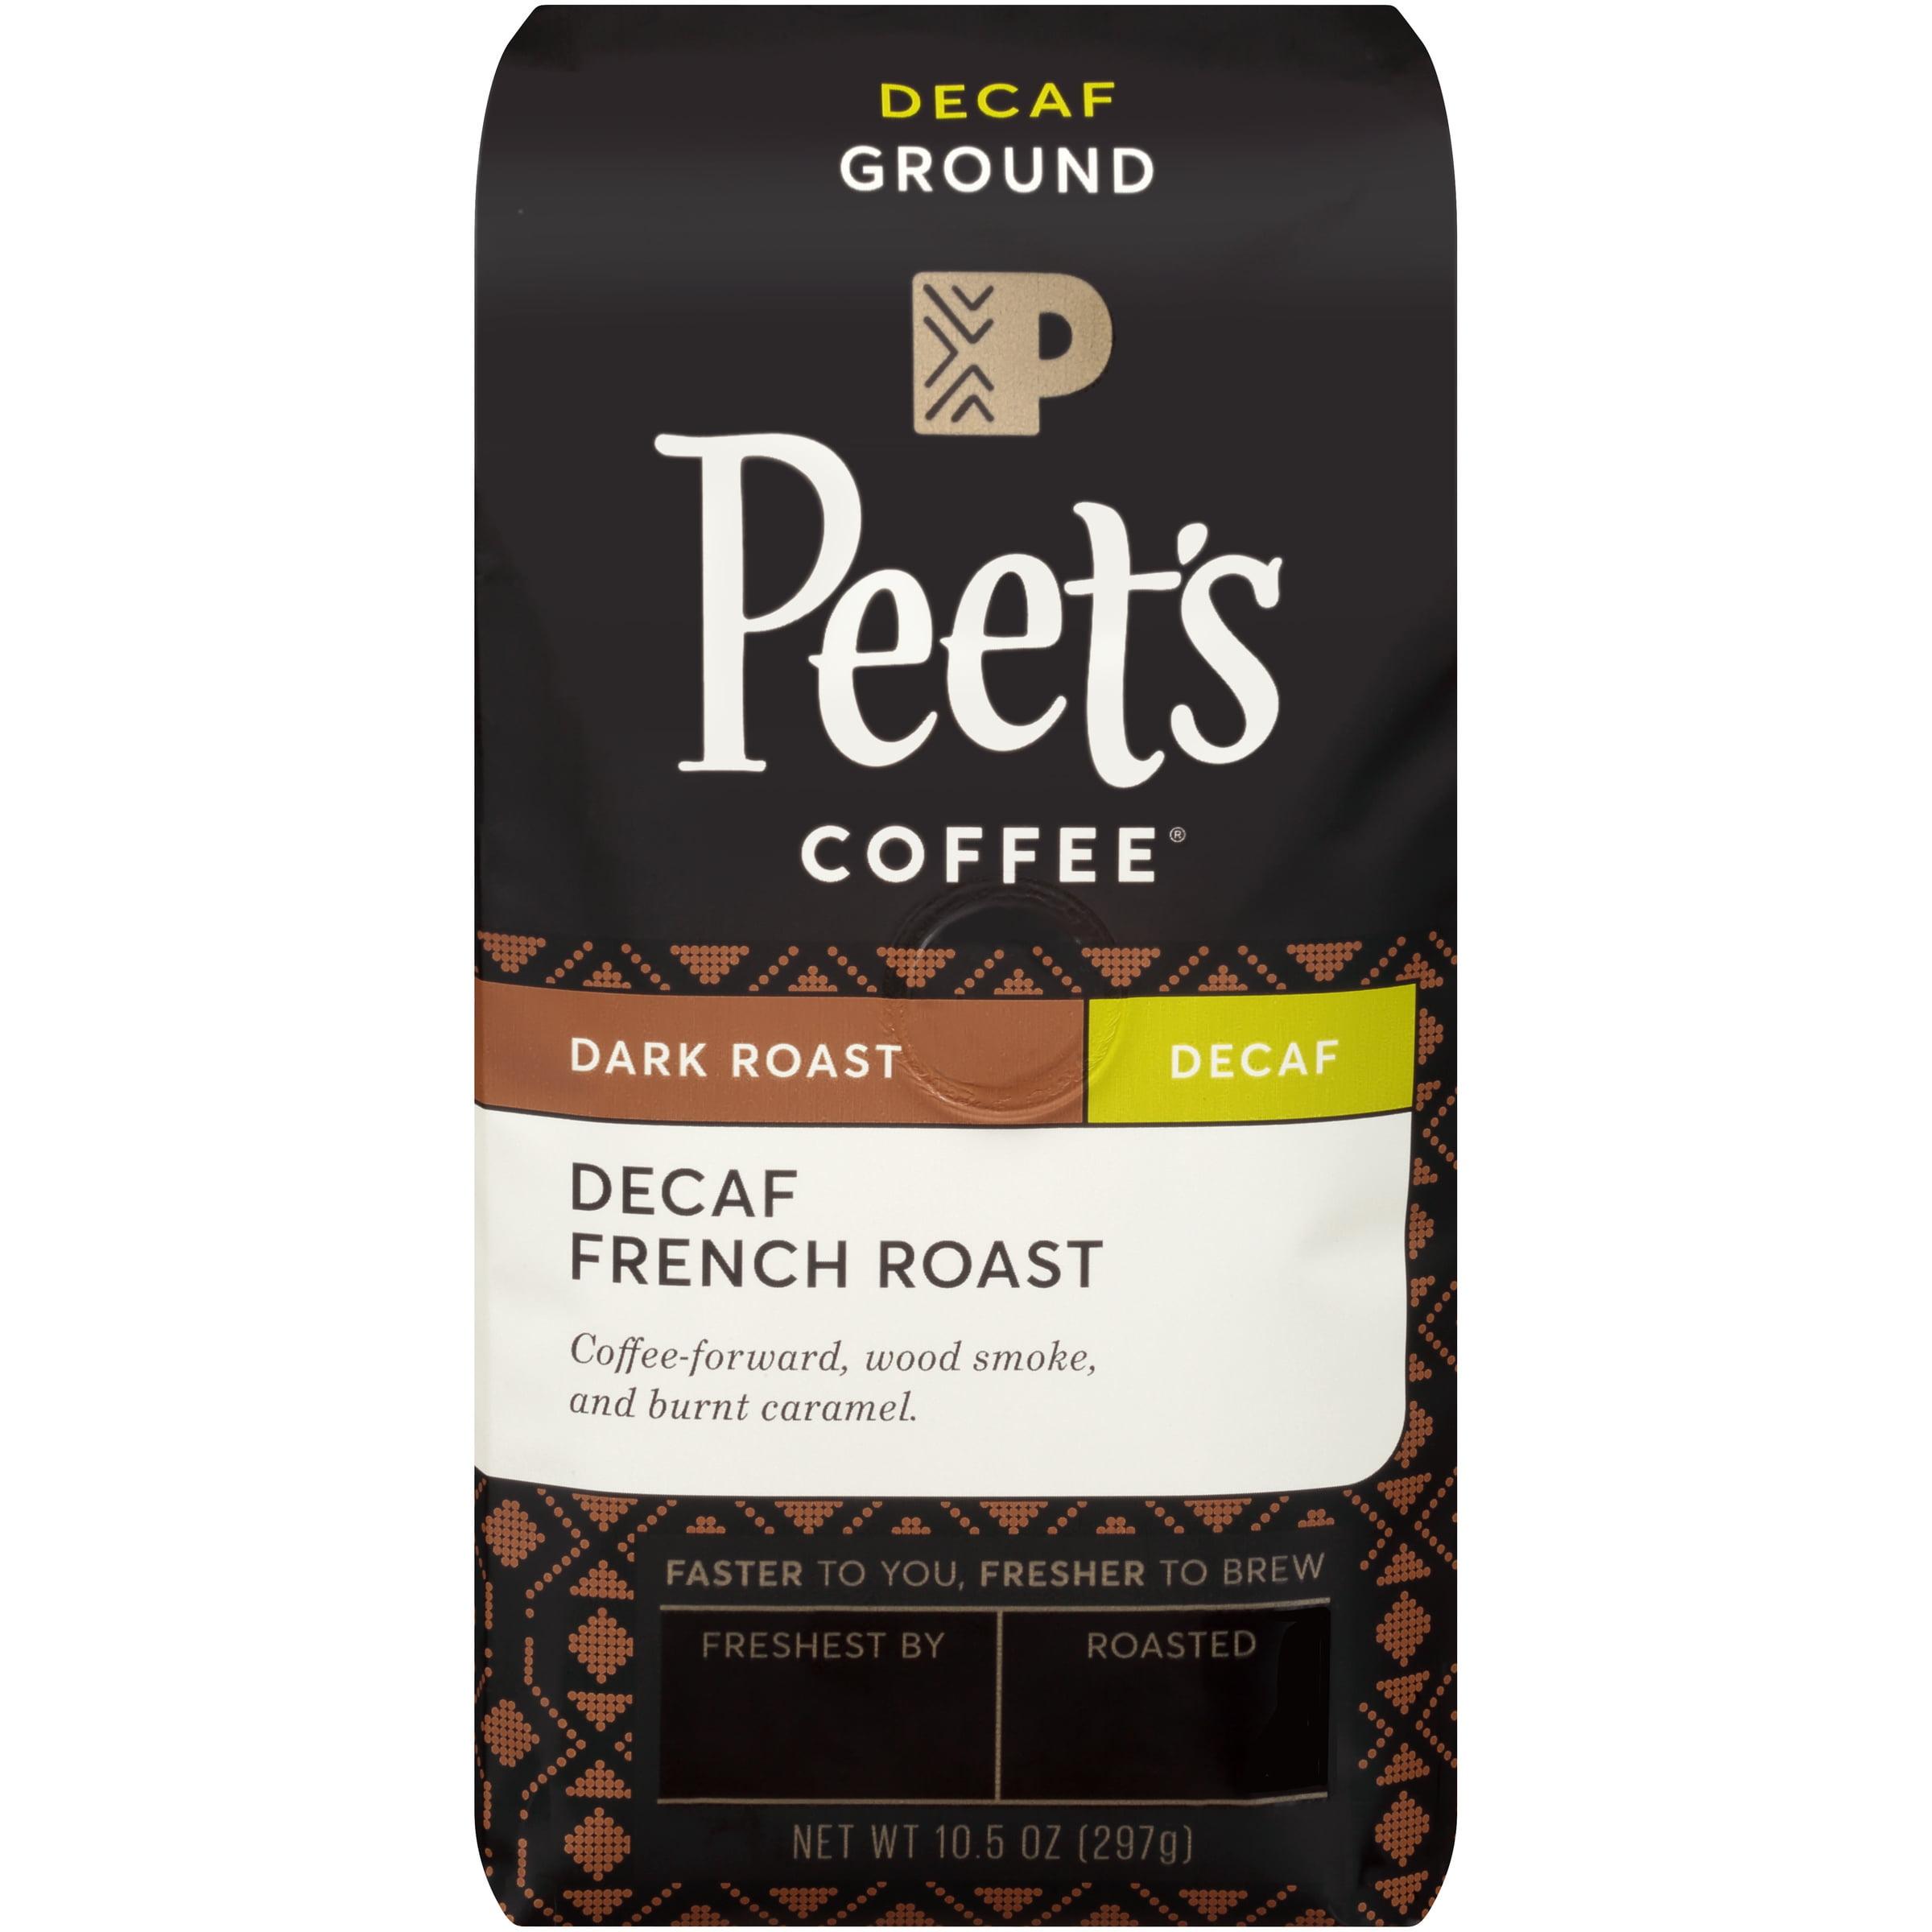 Peet's Coffee® Dark Roast Decaf French Roast Ground Coffee 10.5 oz. Bag - Walmart.com - Walmart.com